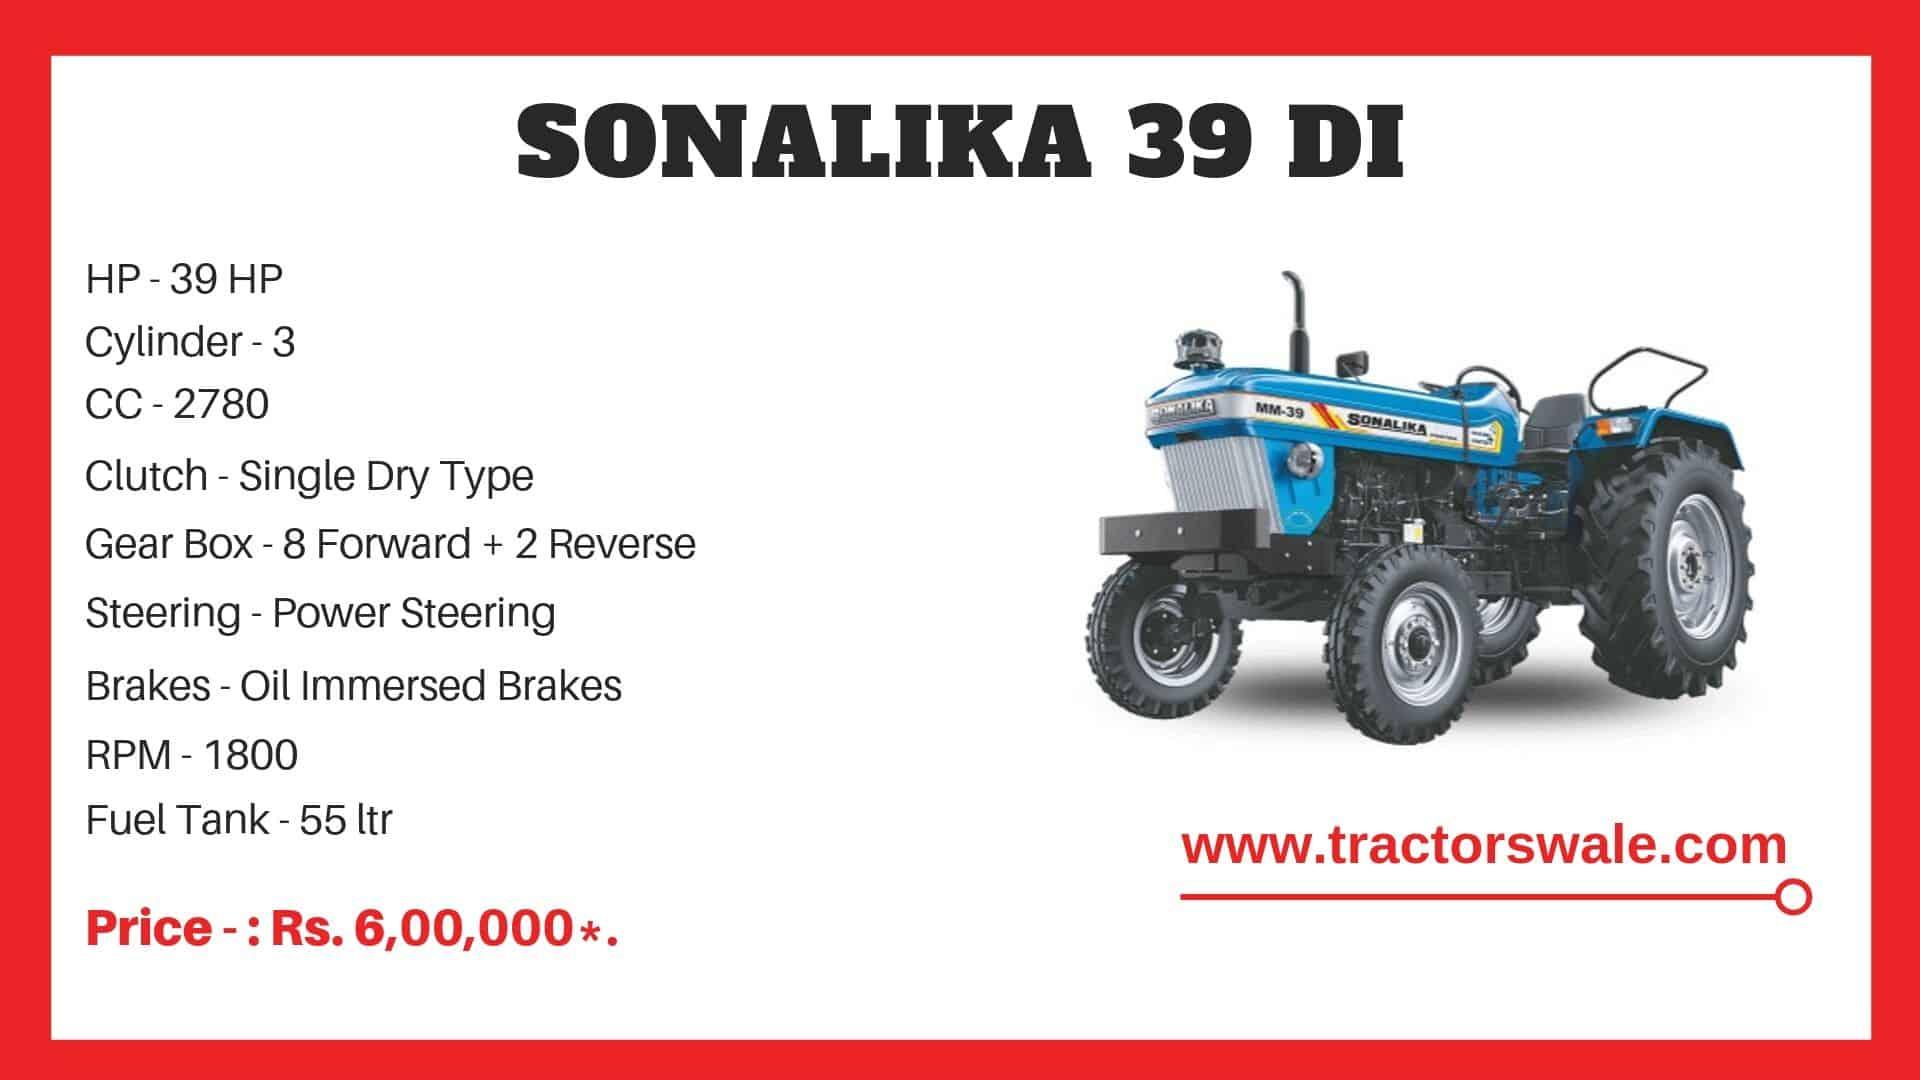 Sonalika MM 39 DI tractor specs